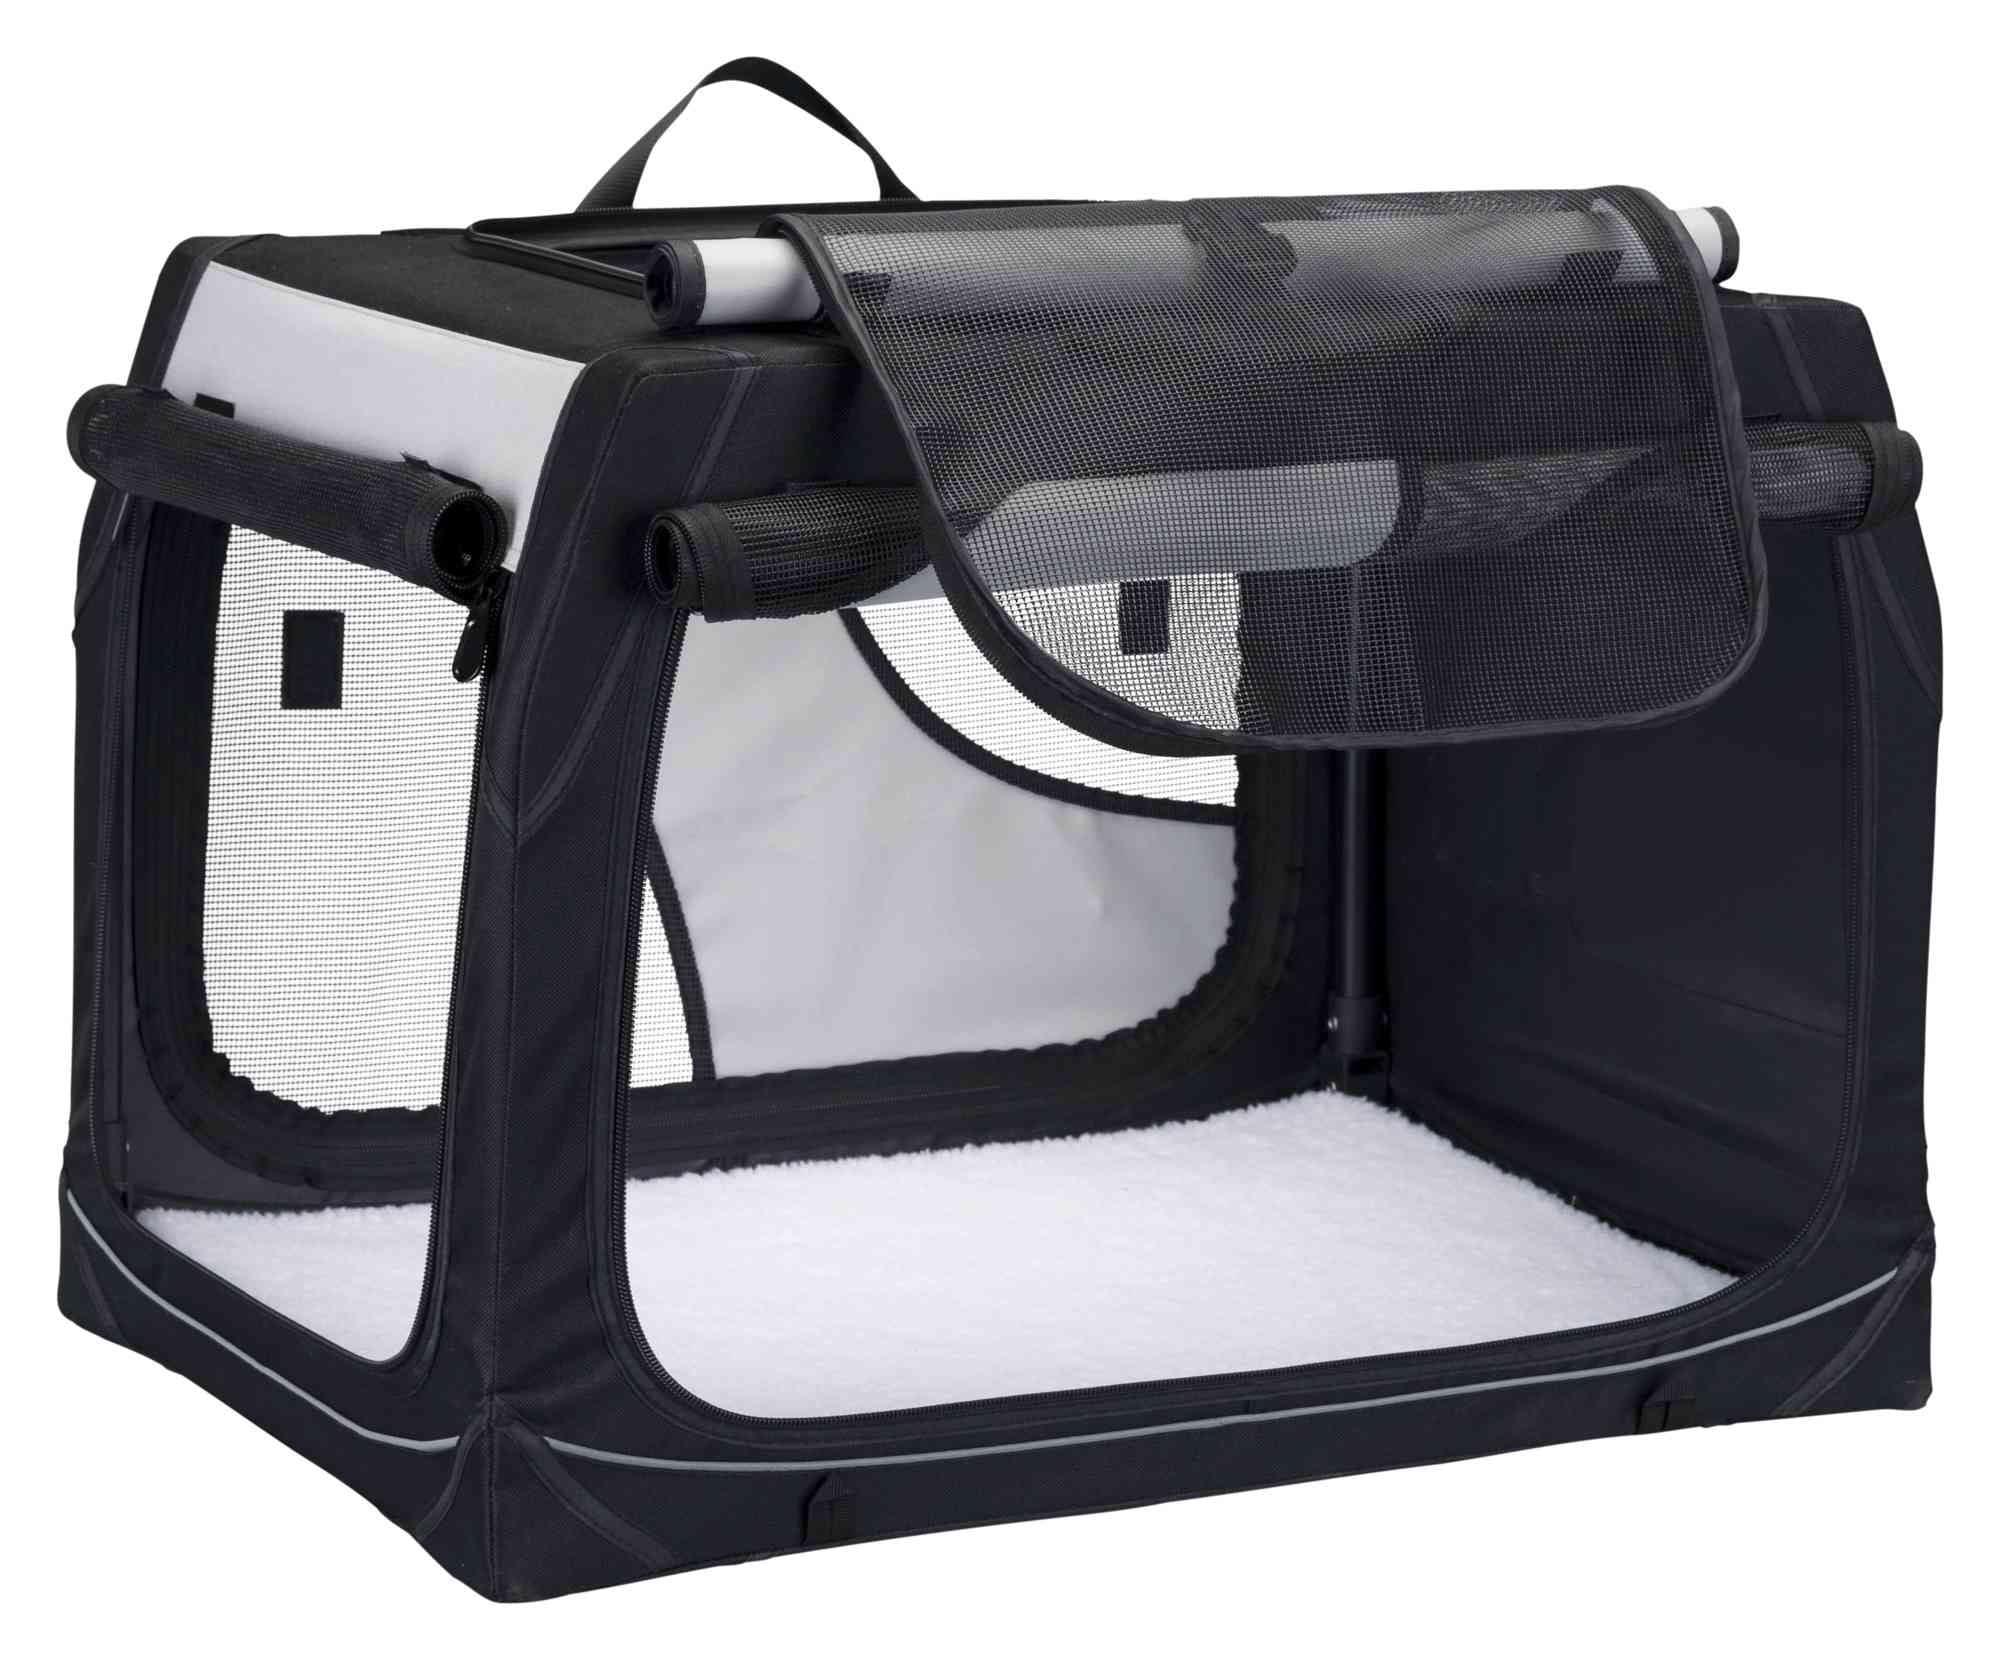 Trixie Vervoersbox  91 x 58 x 61 cm, zwart grijs